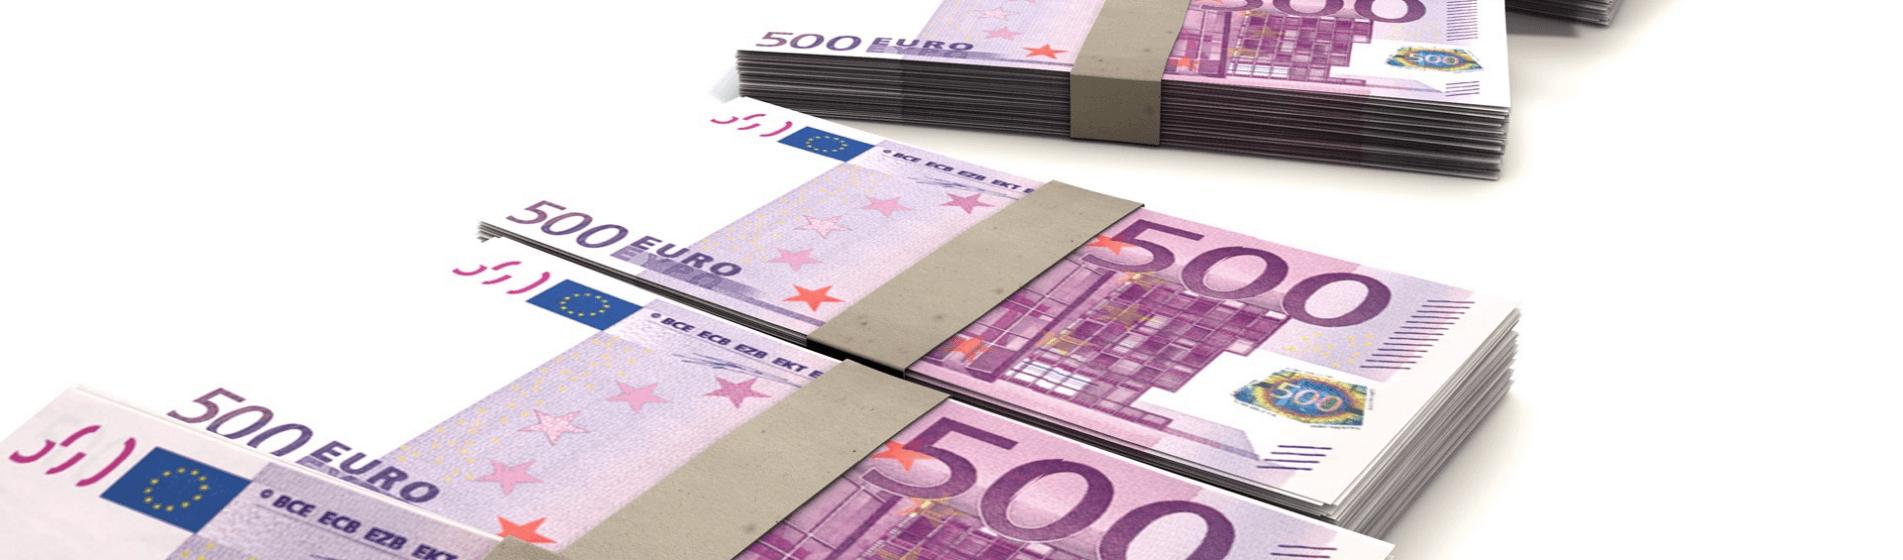 Europe's seemingly harmless new capital controls